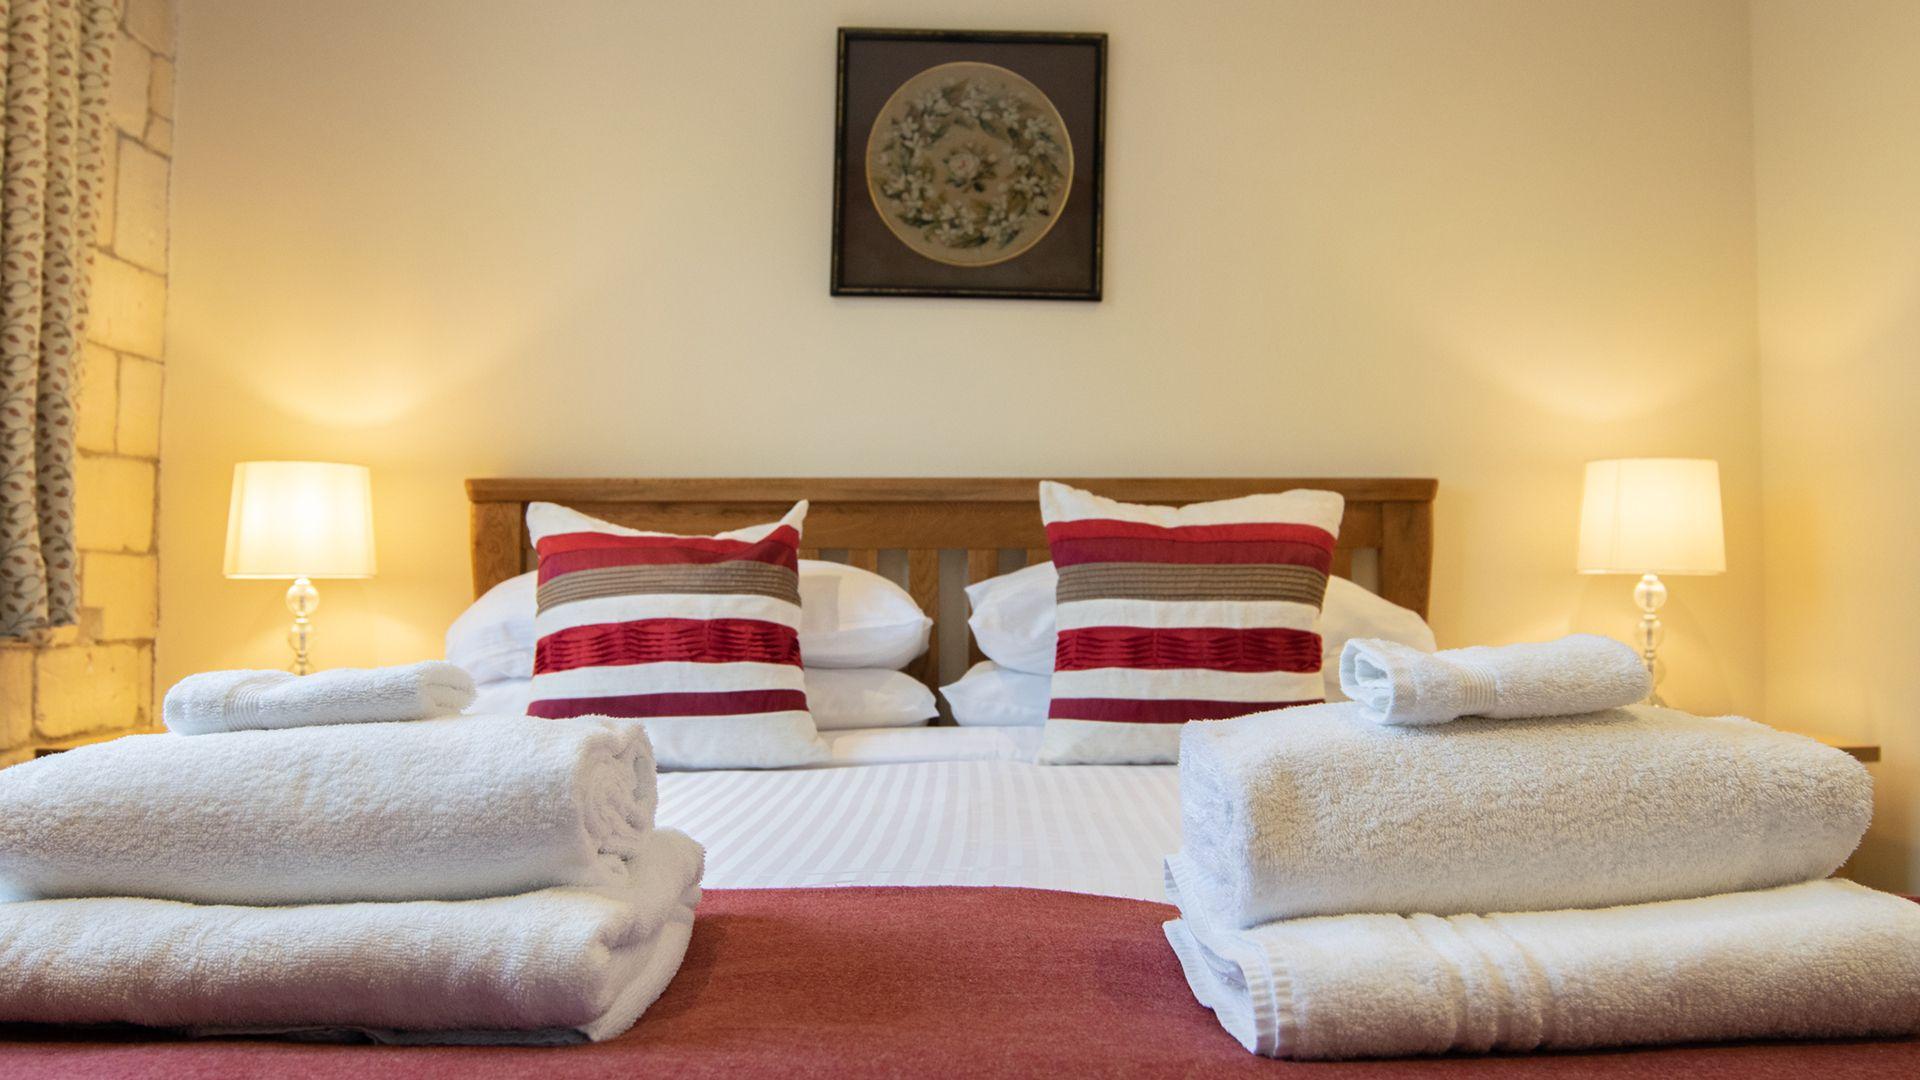 Bedroom 1, Princess Elizabeth at Sudeley Castle, Bolthole Retreats